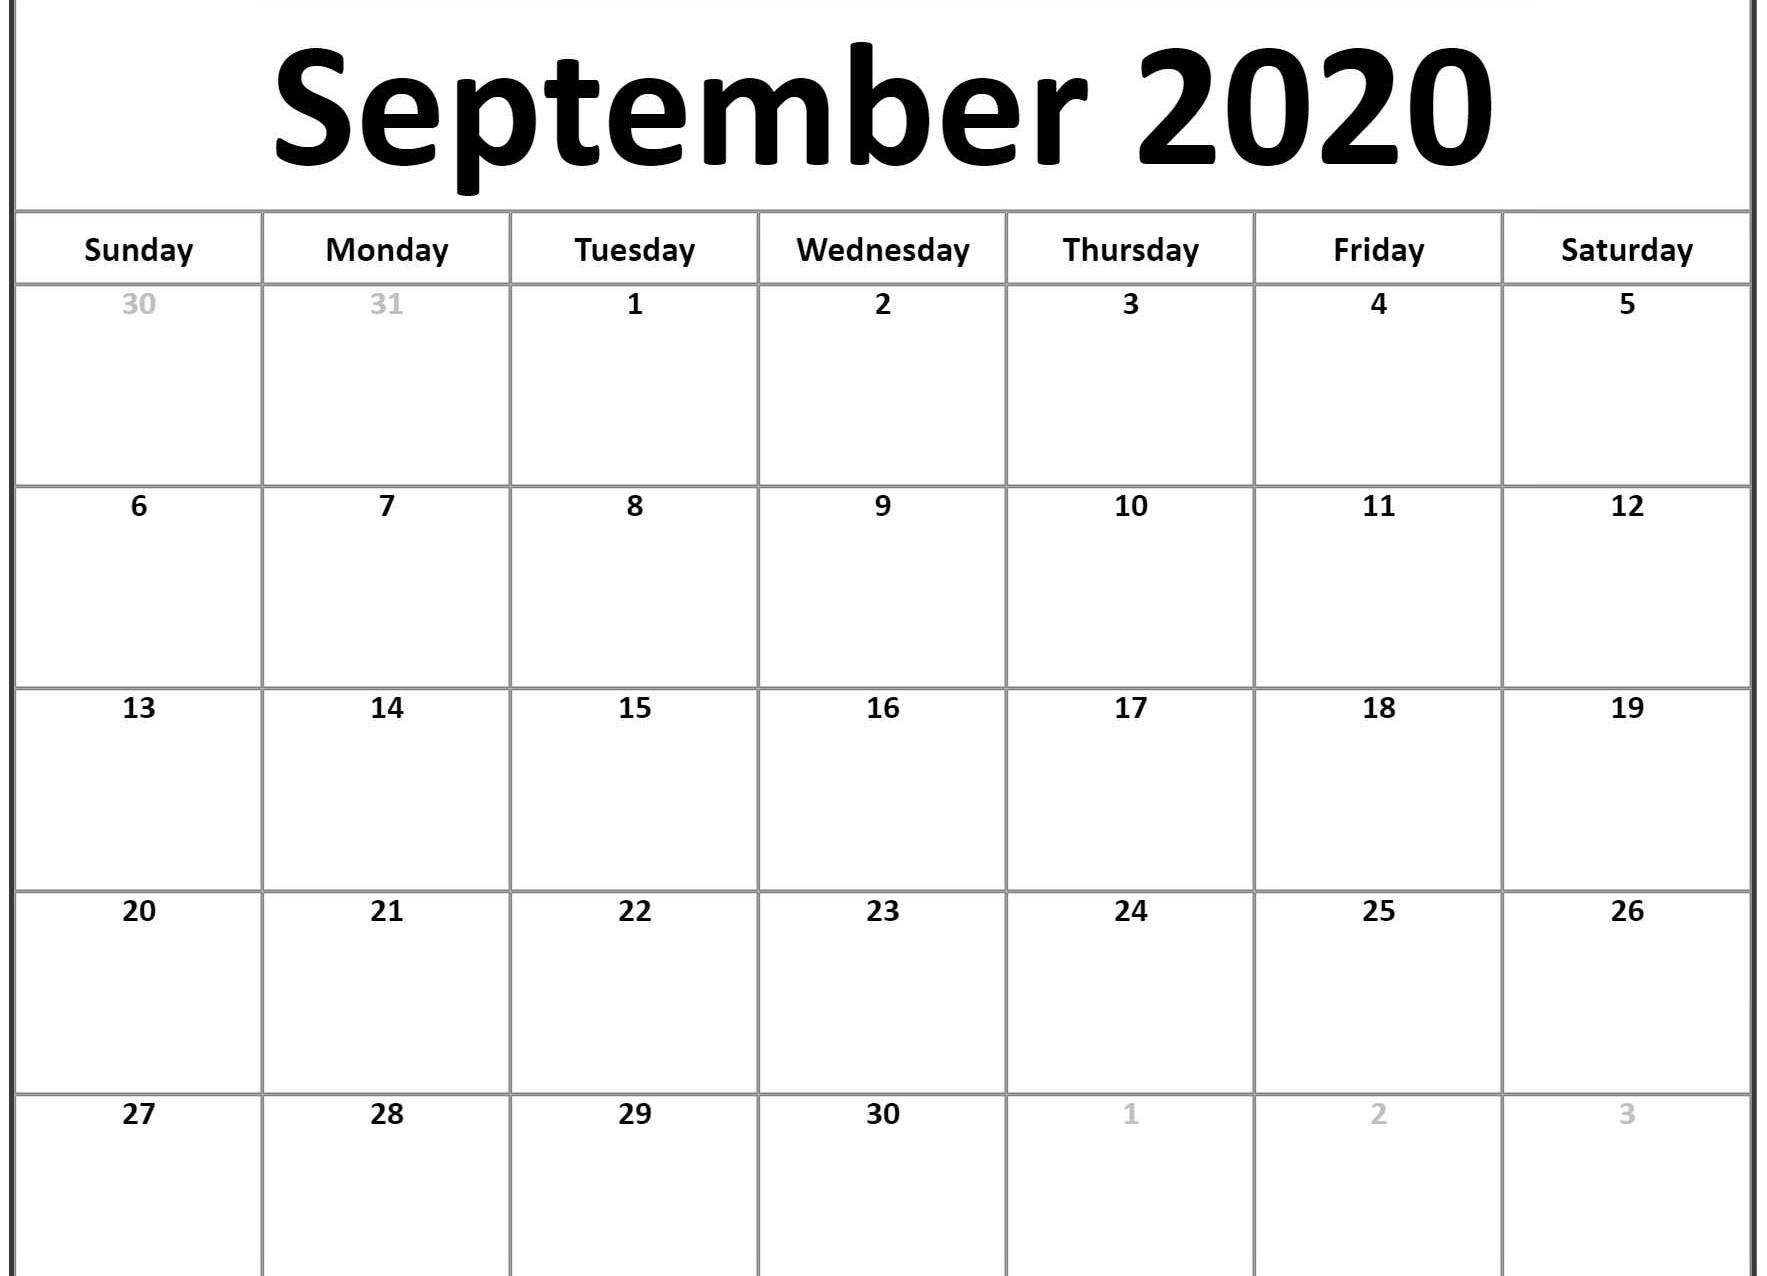 Awesome September 2020 Calendar PDF Word Excel Printable Template 1767x1276